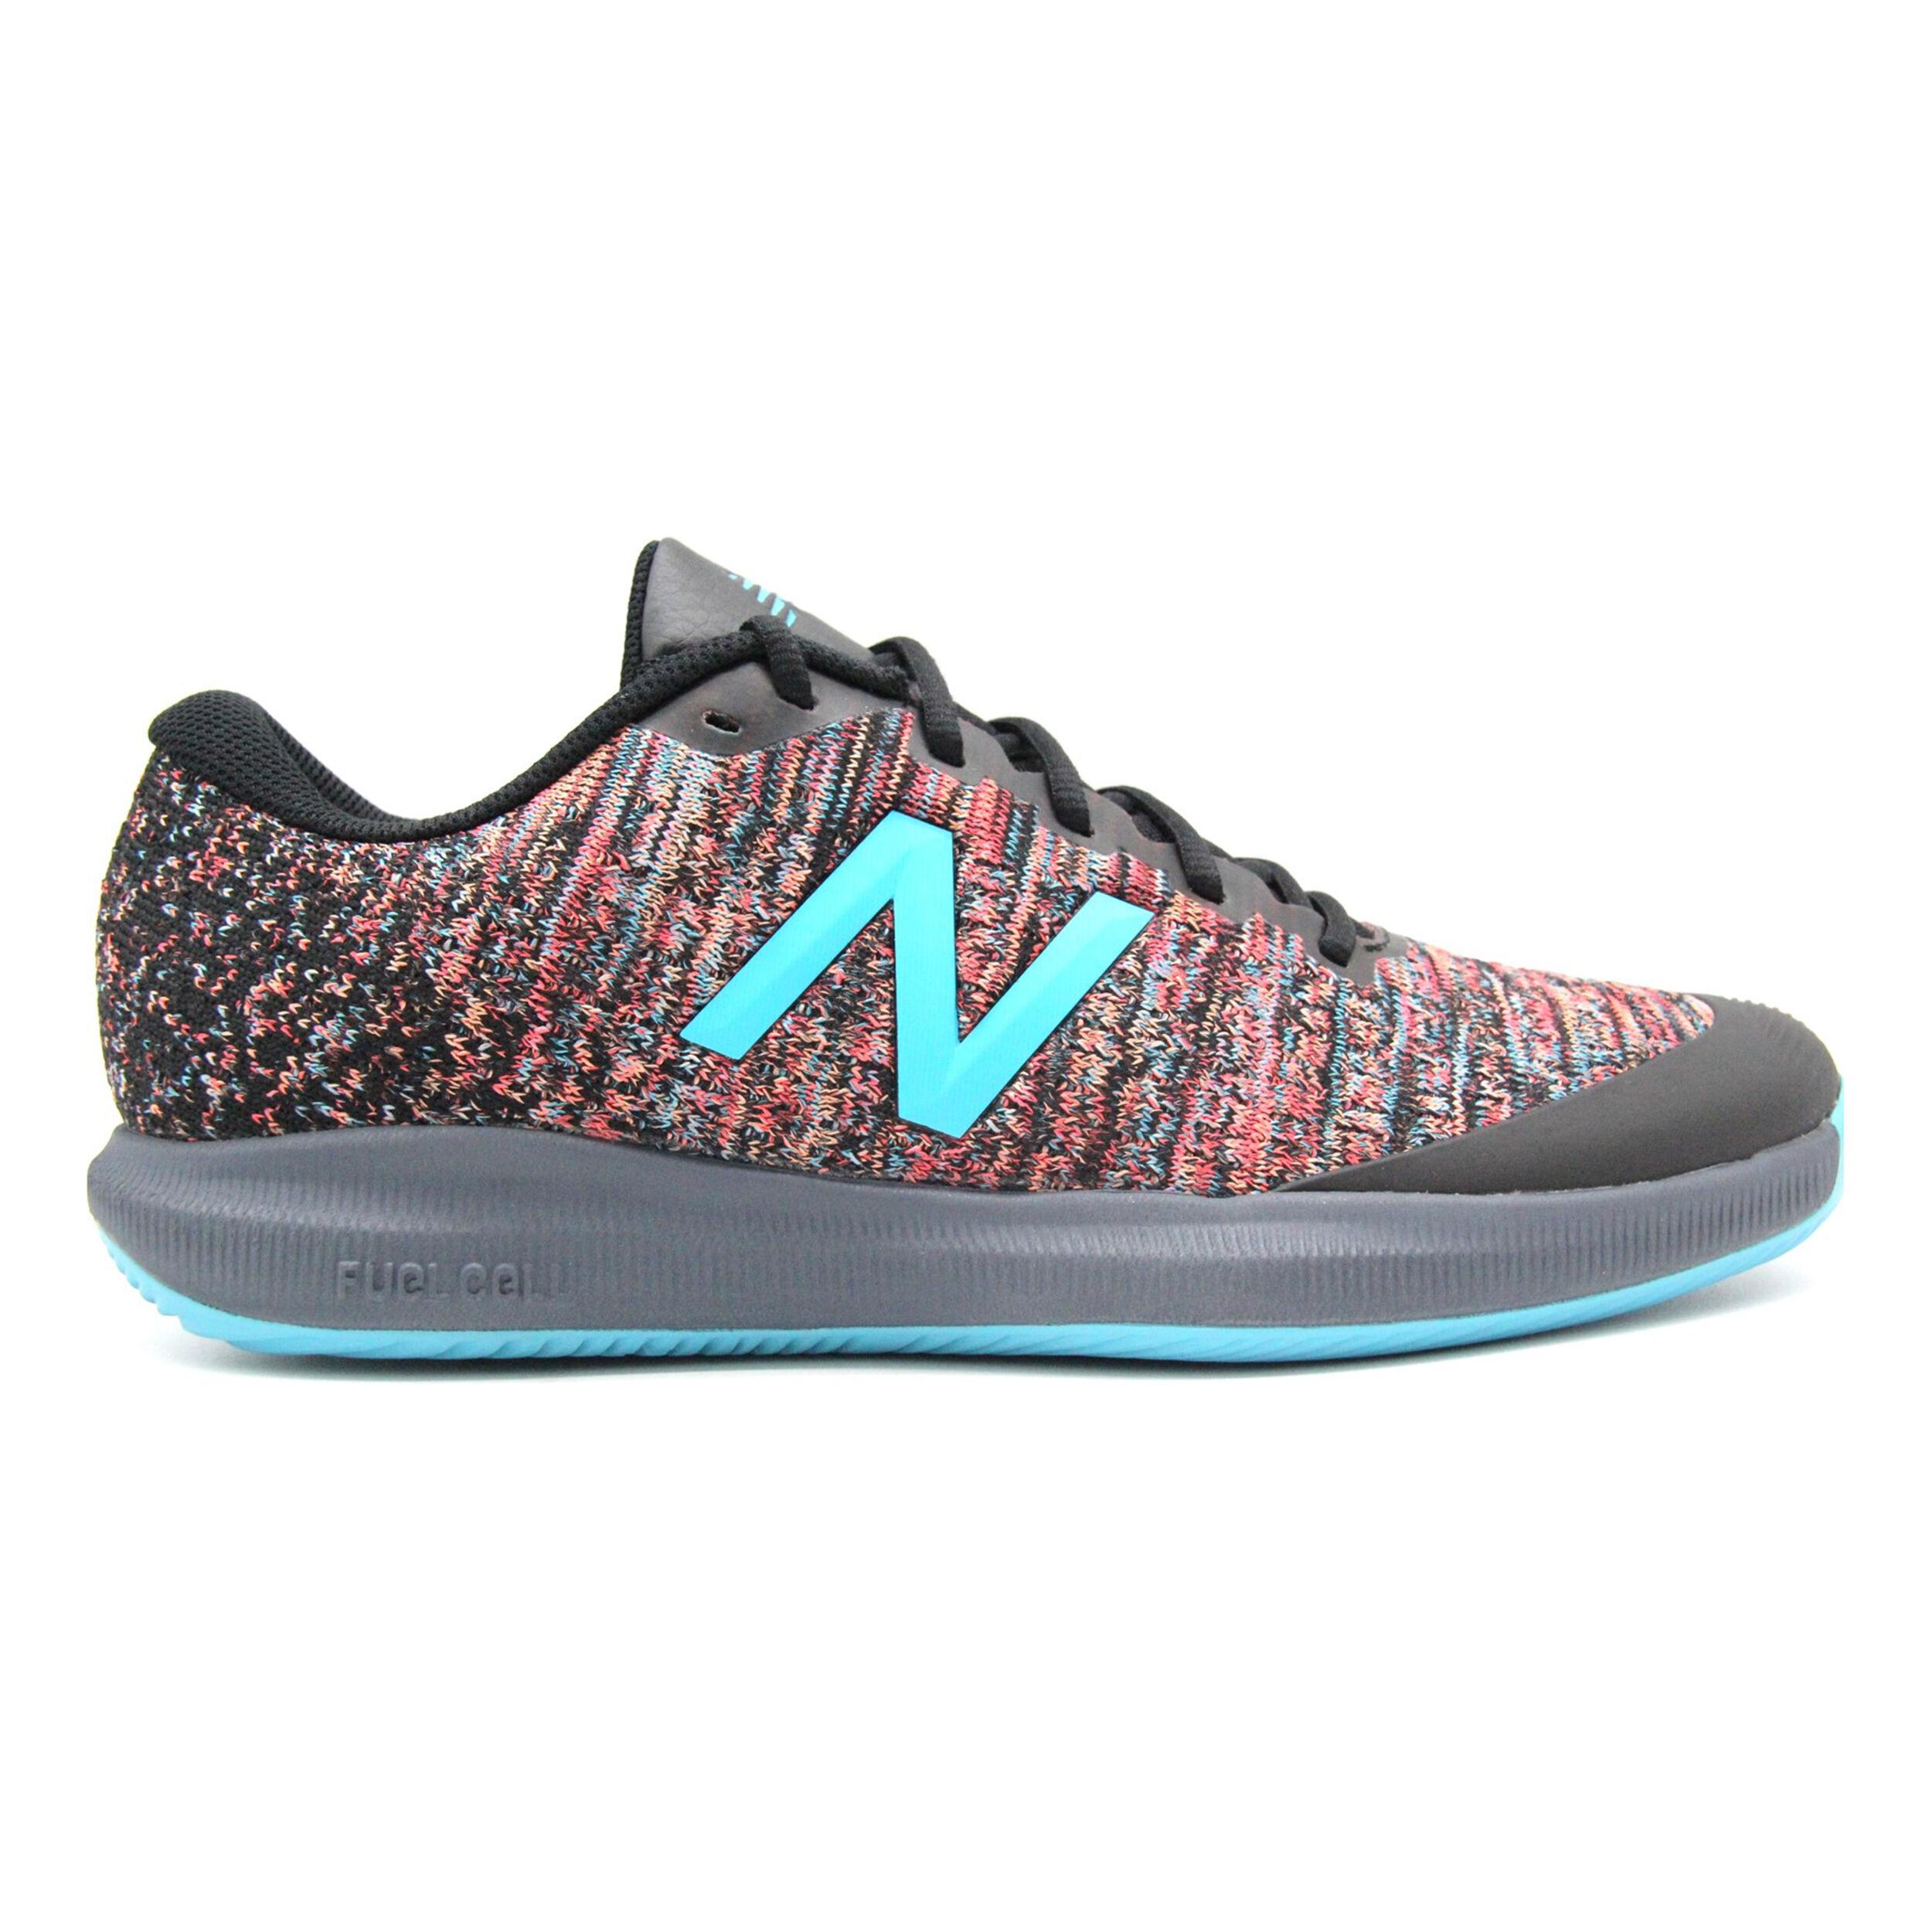 chaussures tennis hommes new balance 996